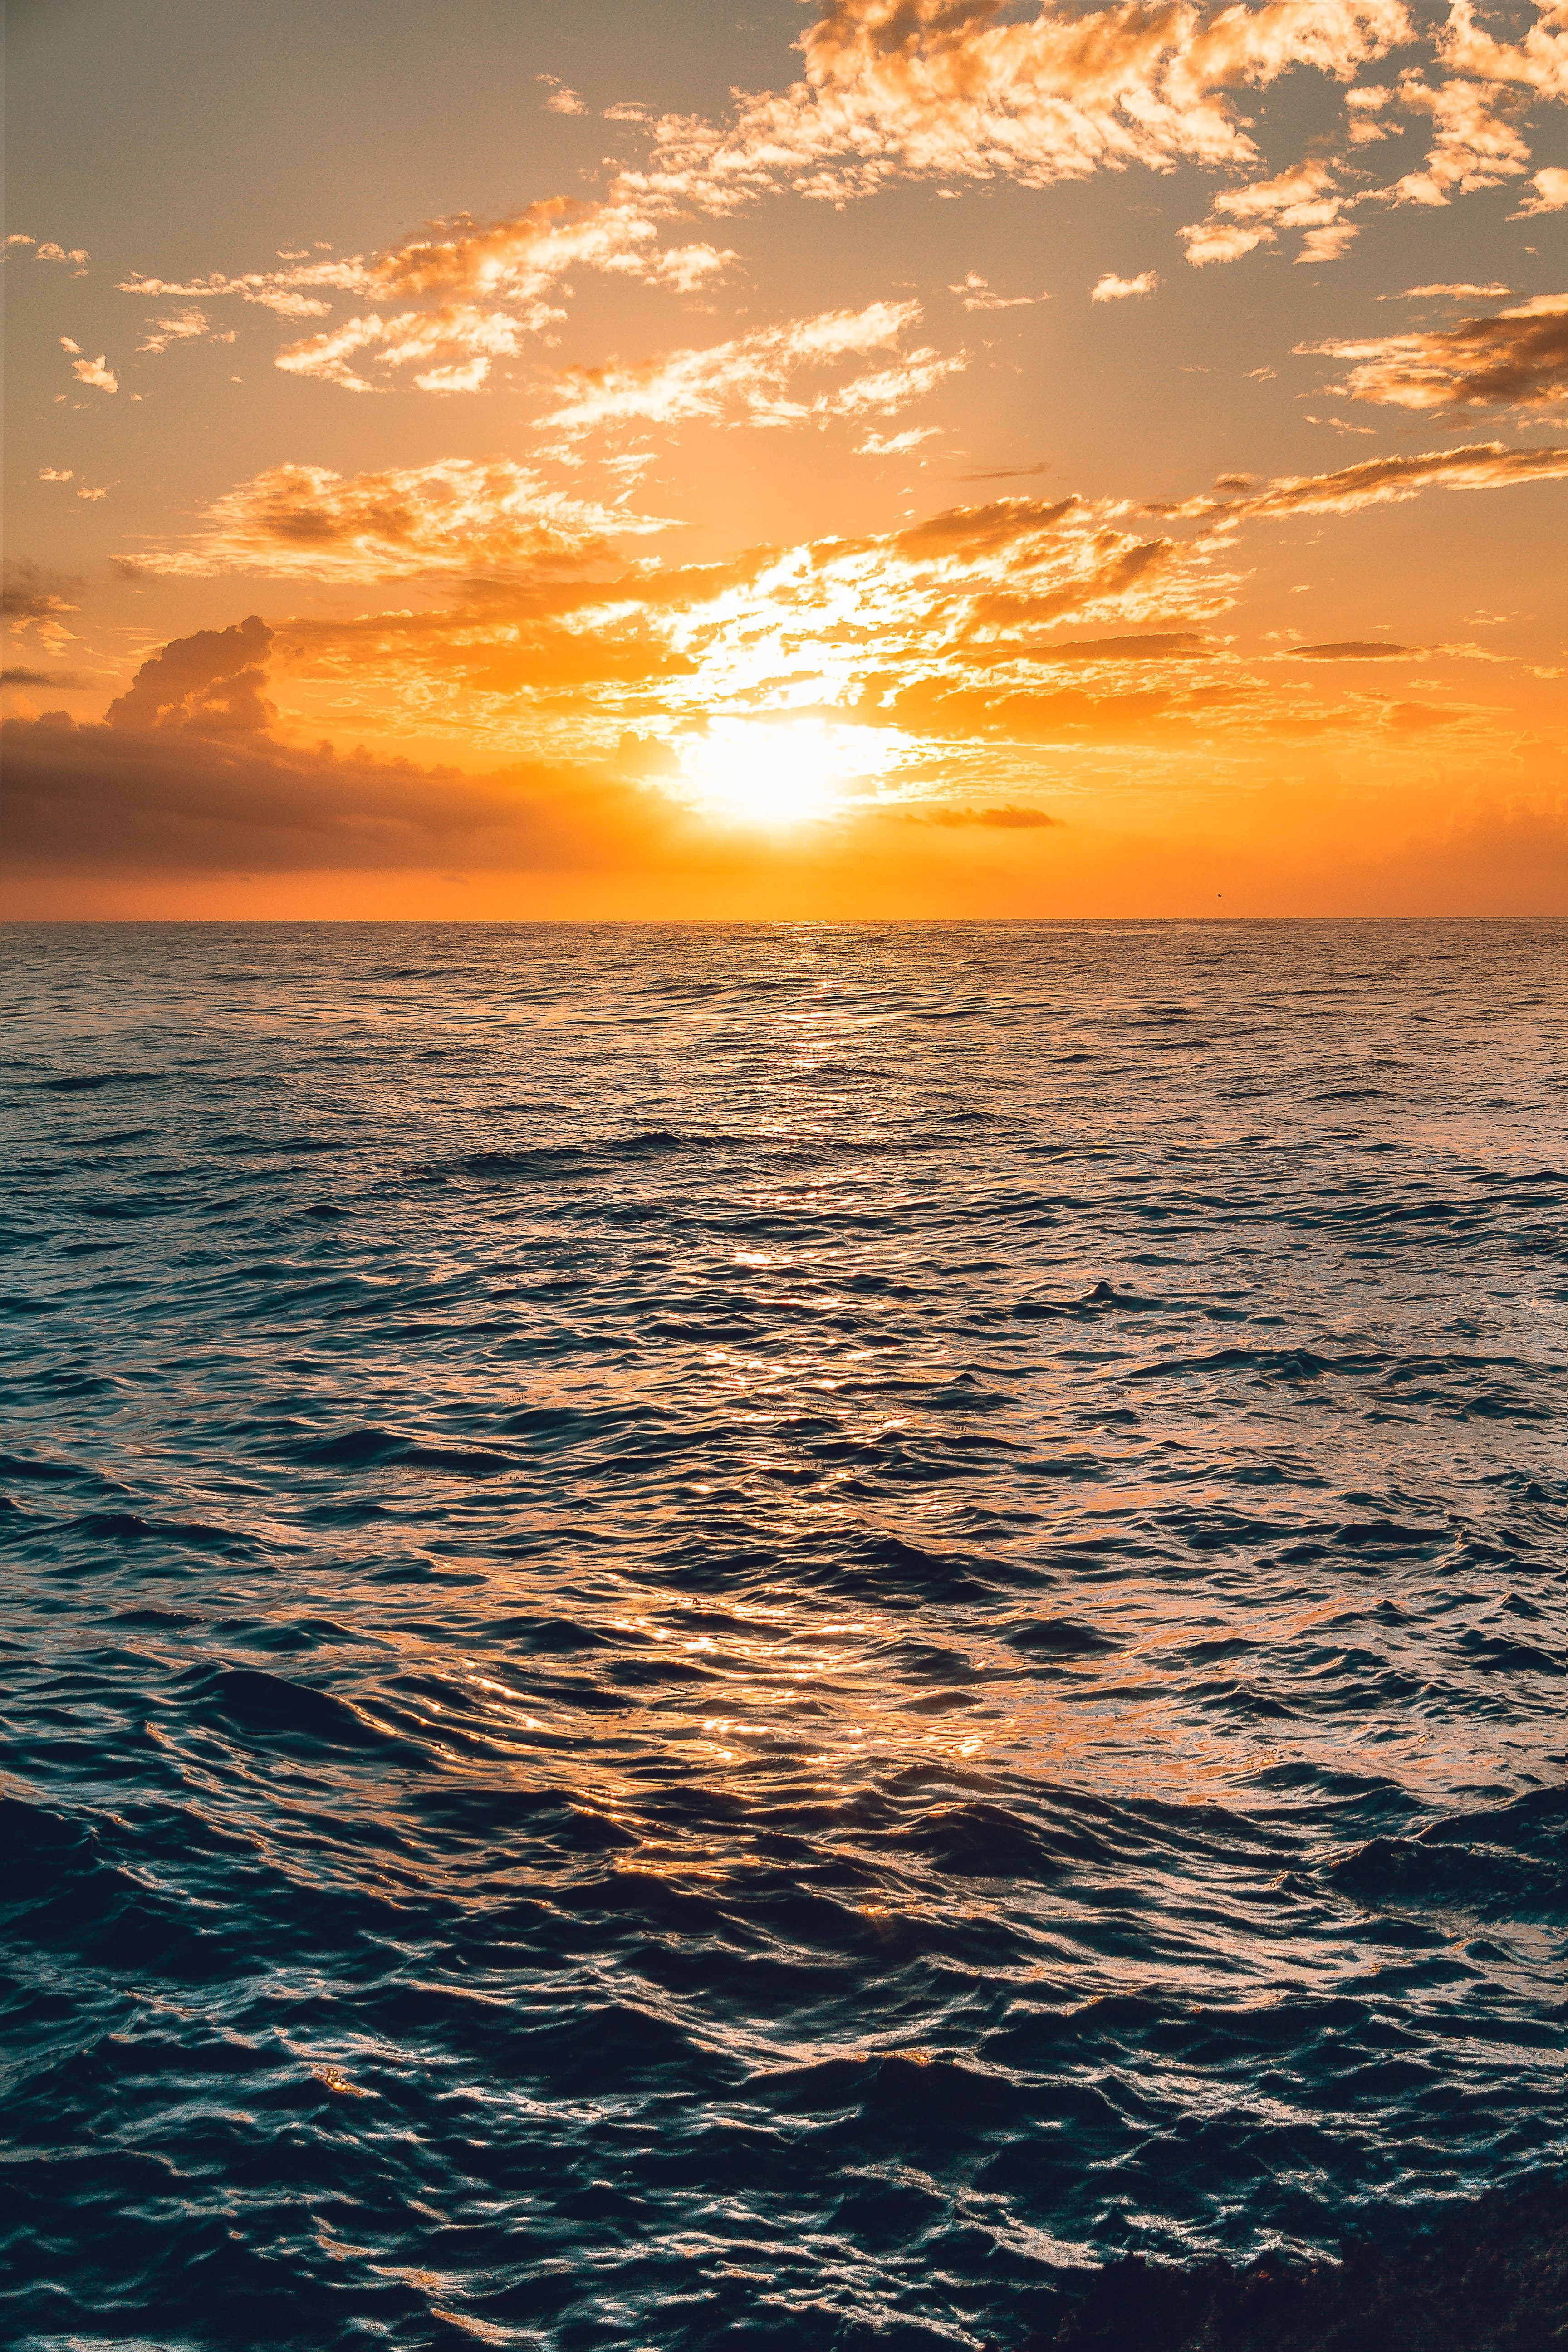 Sunset Nature Outdoors Sea Under Clear Sea Under Clear Blue Sky Sunrise Wallpaper Sunrise Landscape Landscape Pictures